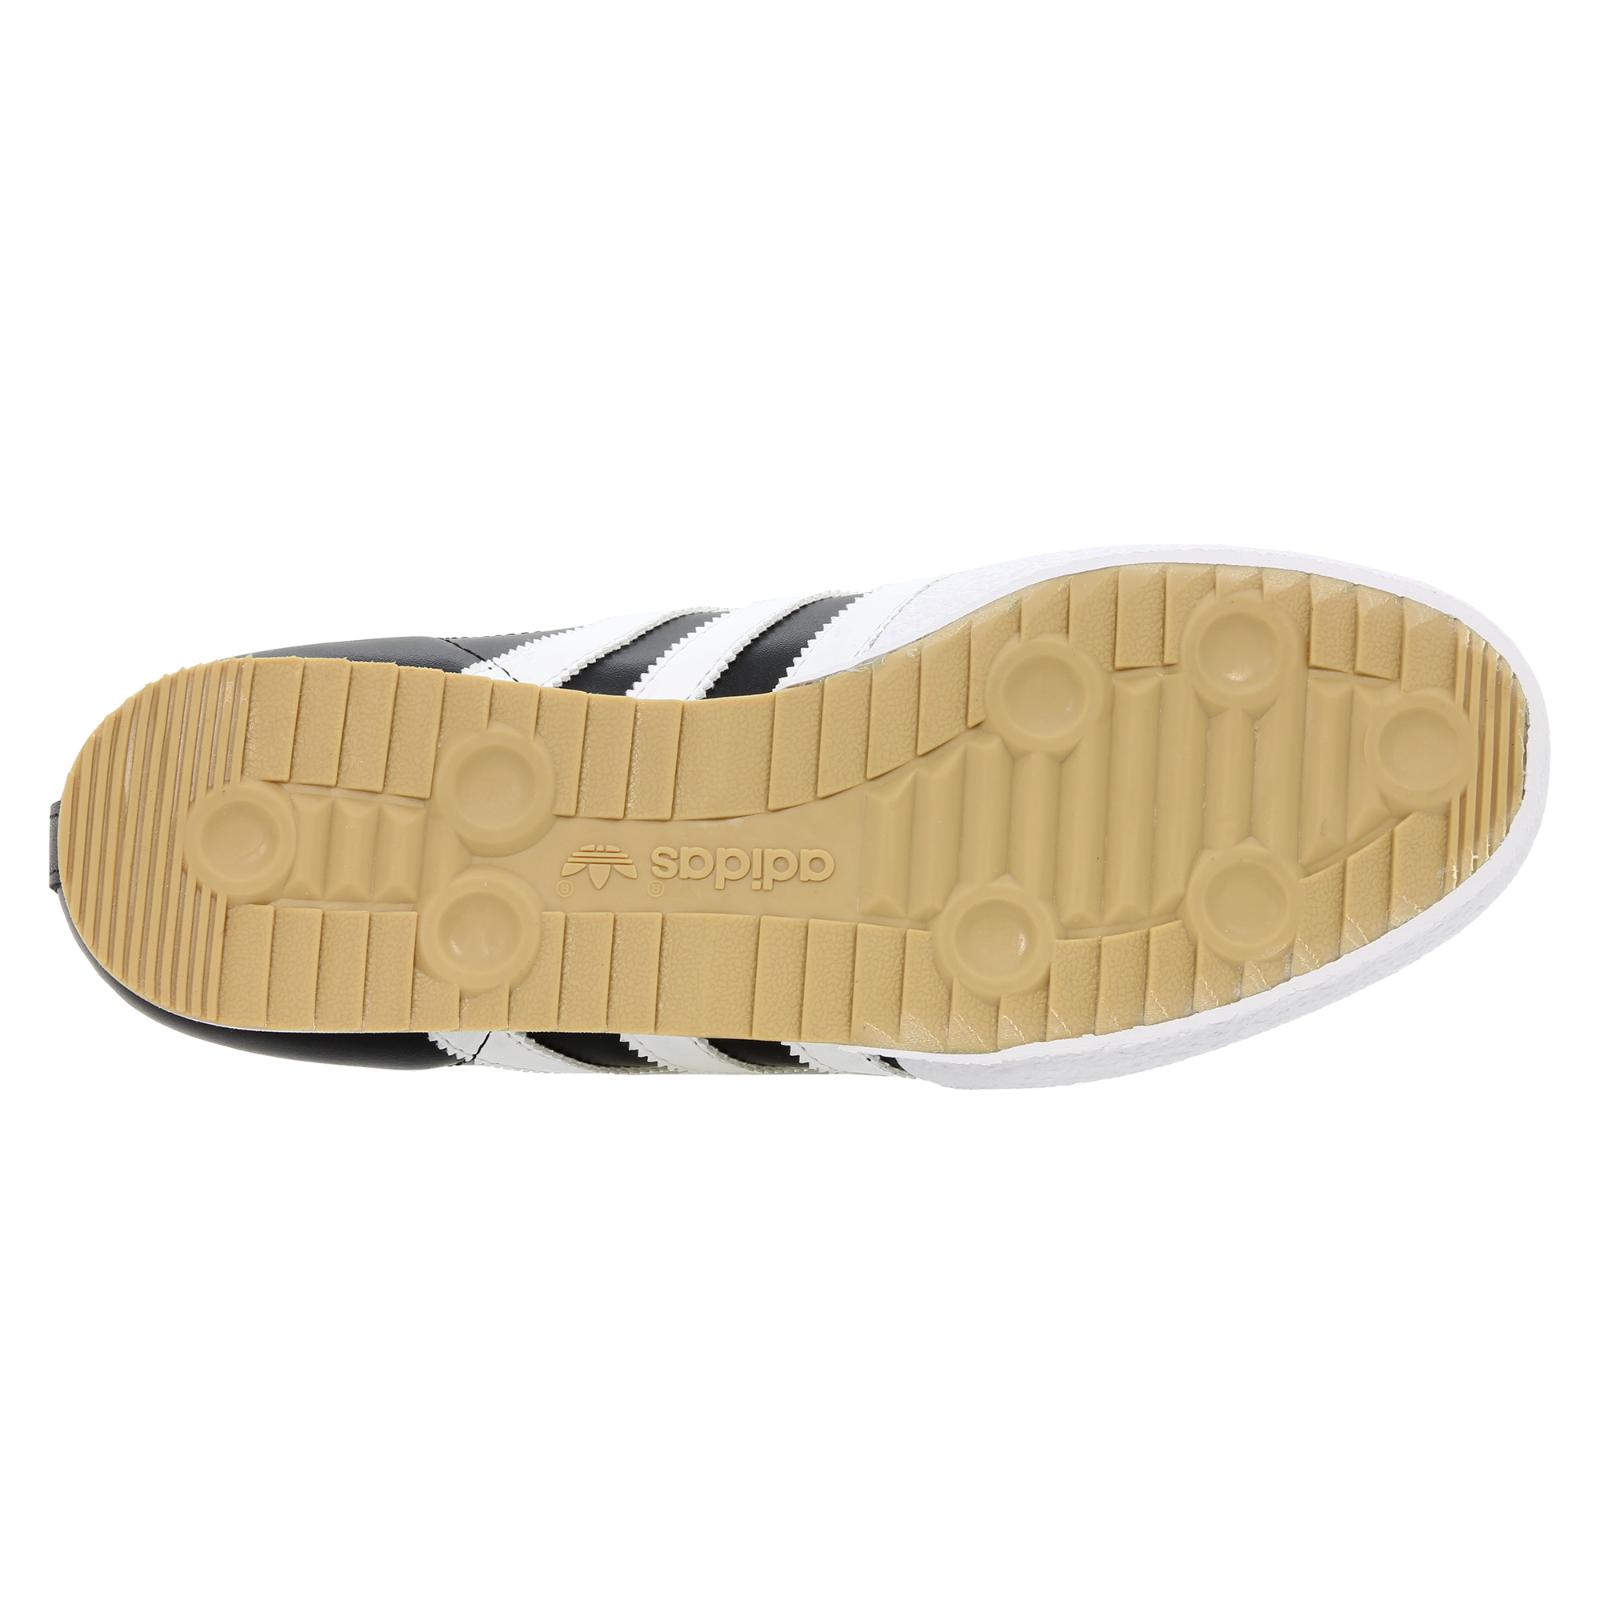 Adidas-Originaux-Baskets-Multi-Annonces-Chaussures-Beckenbauer-Stan-Smith-Zx miniature 9